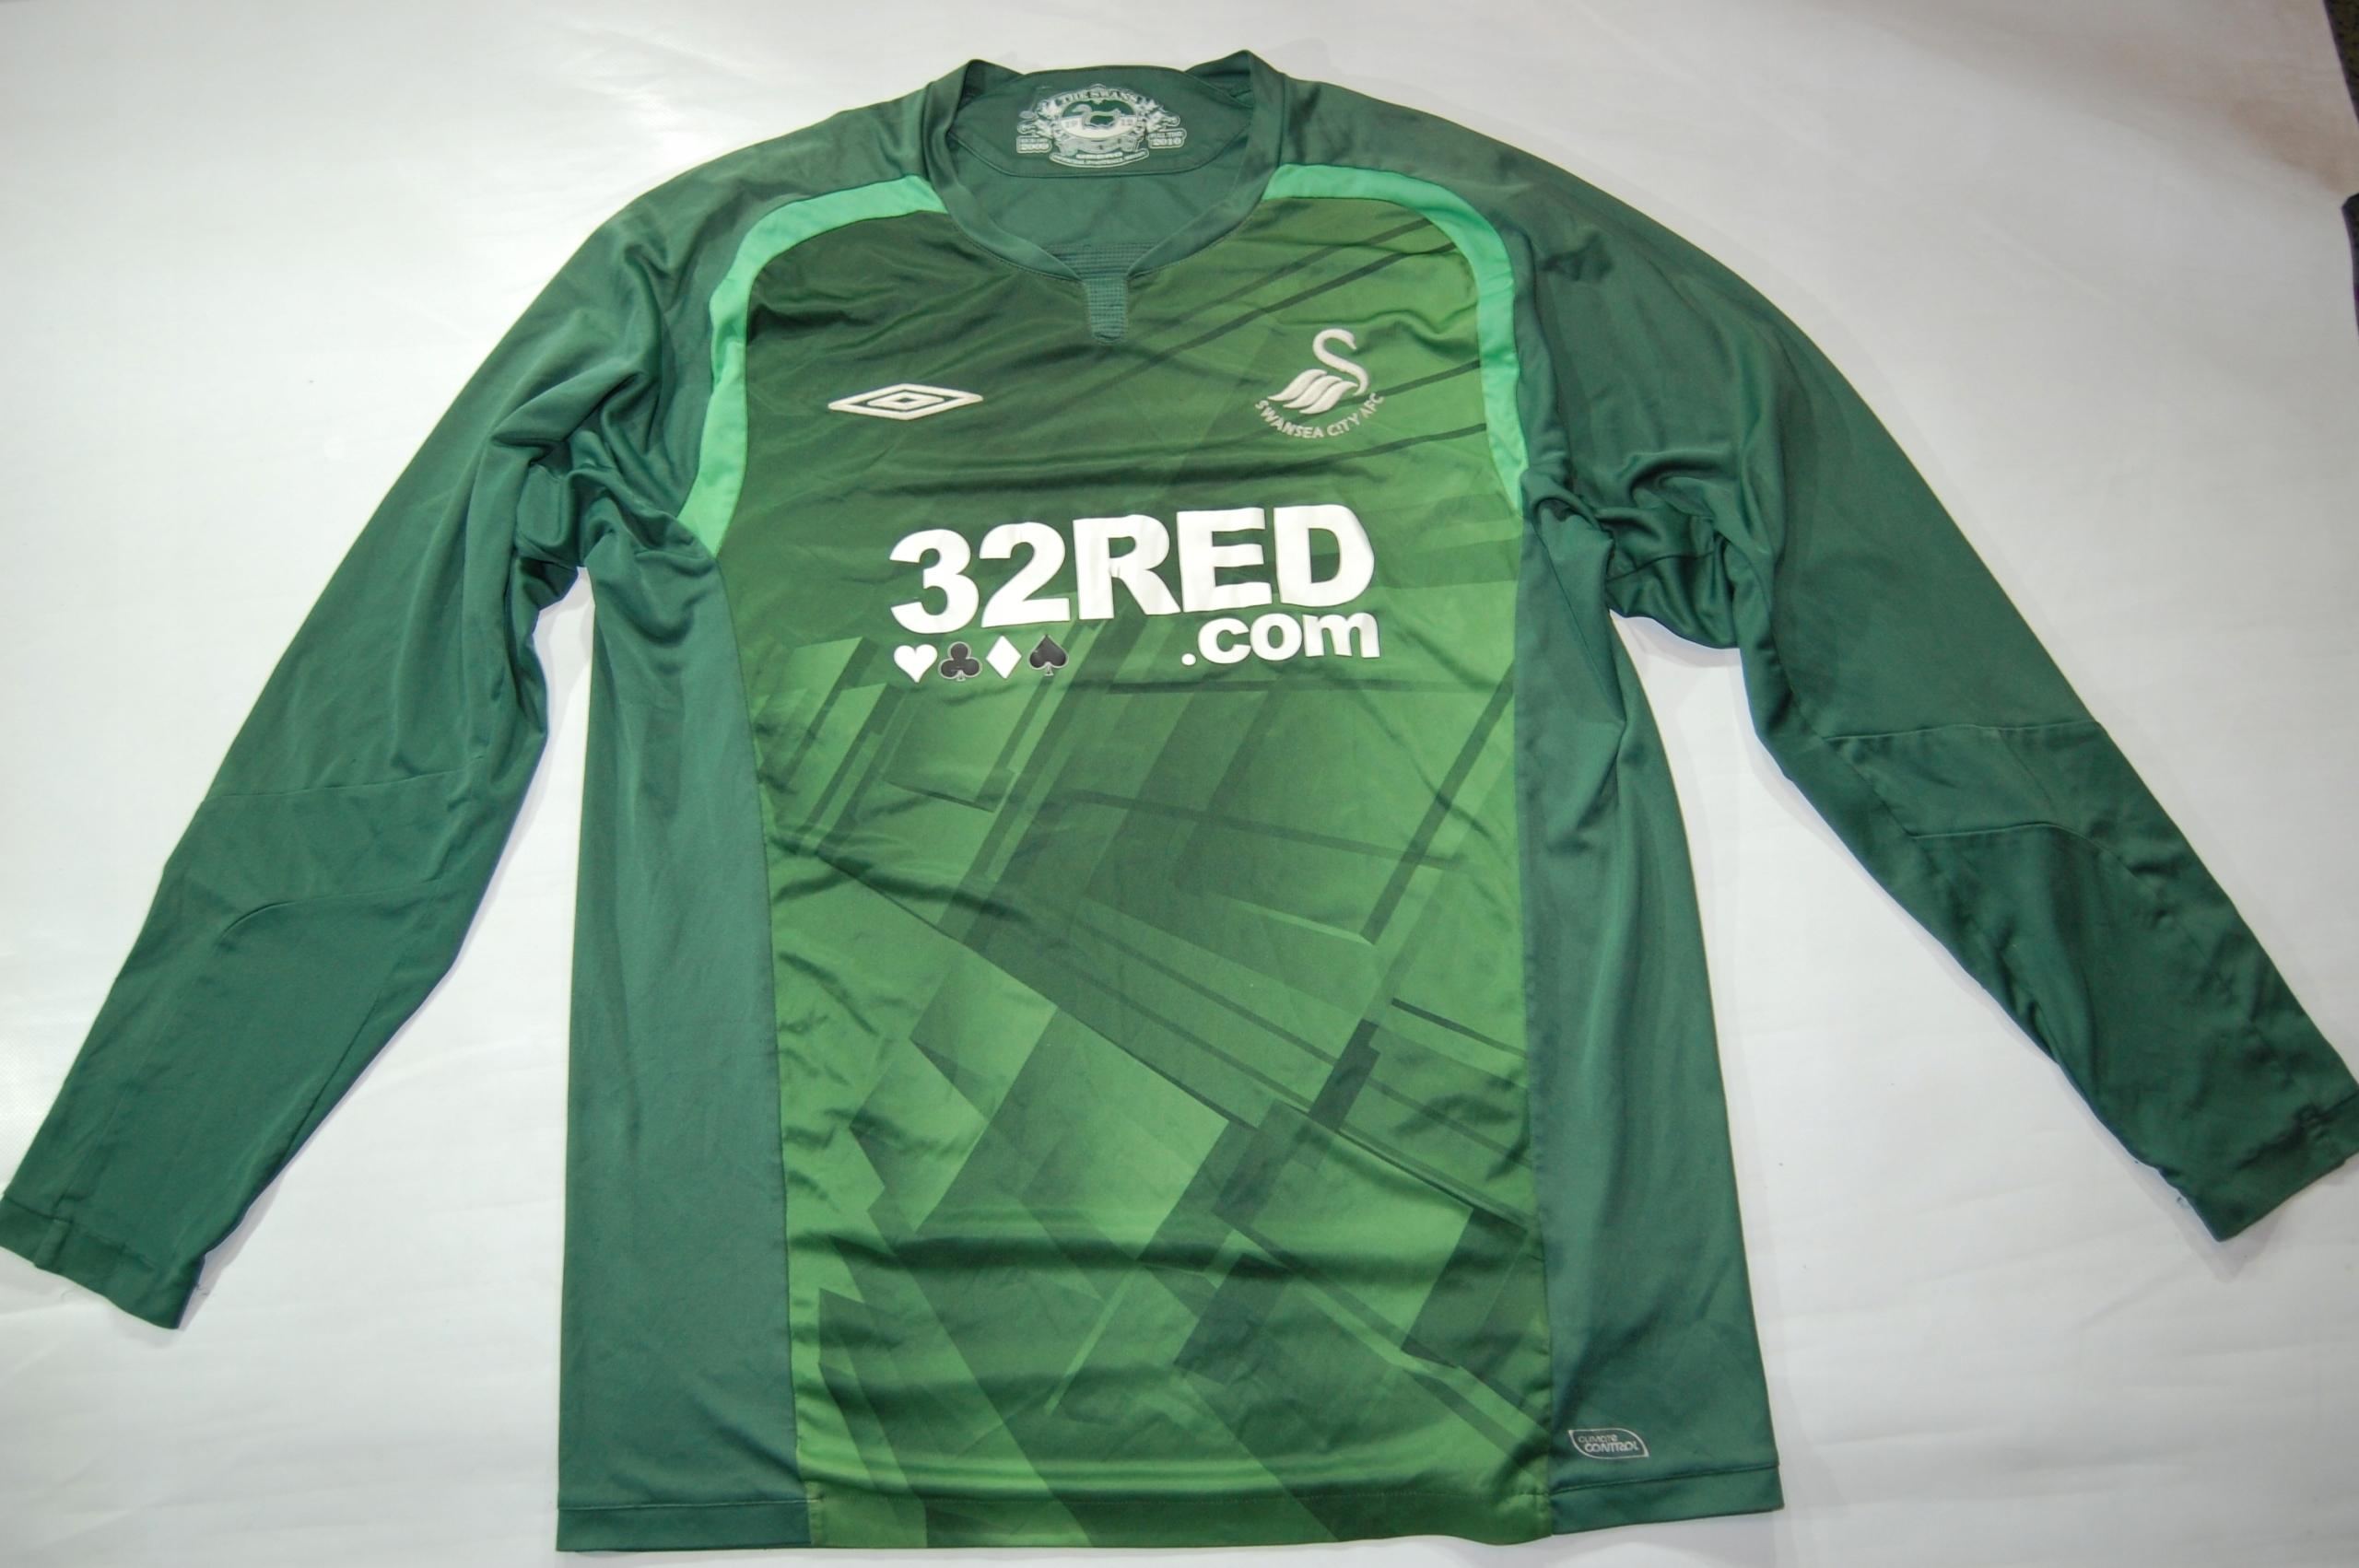 Koszulka Umbro Swansea Rozmiar L/XL